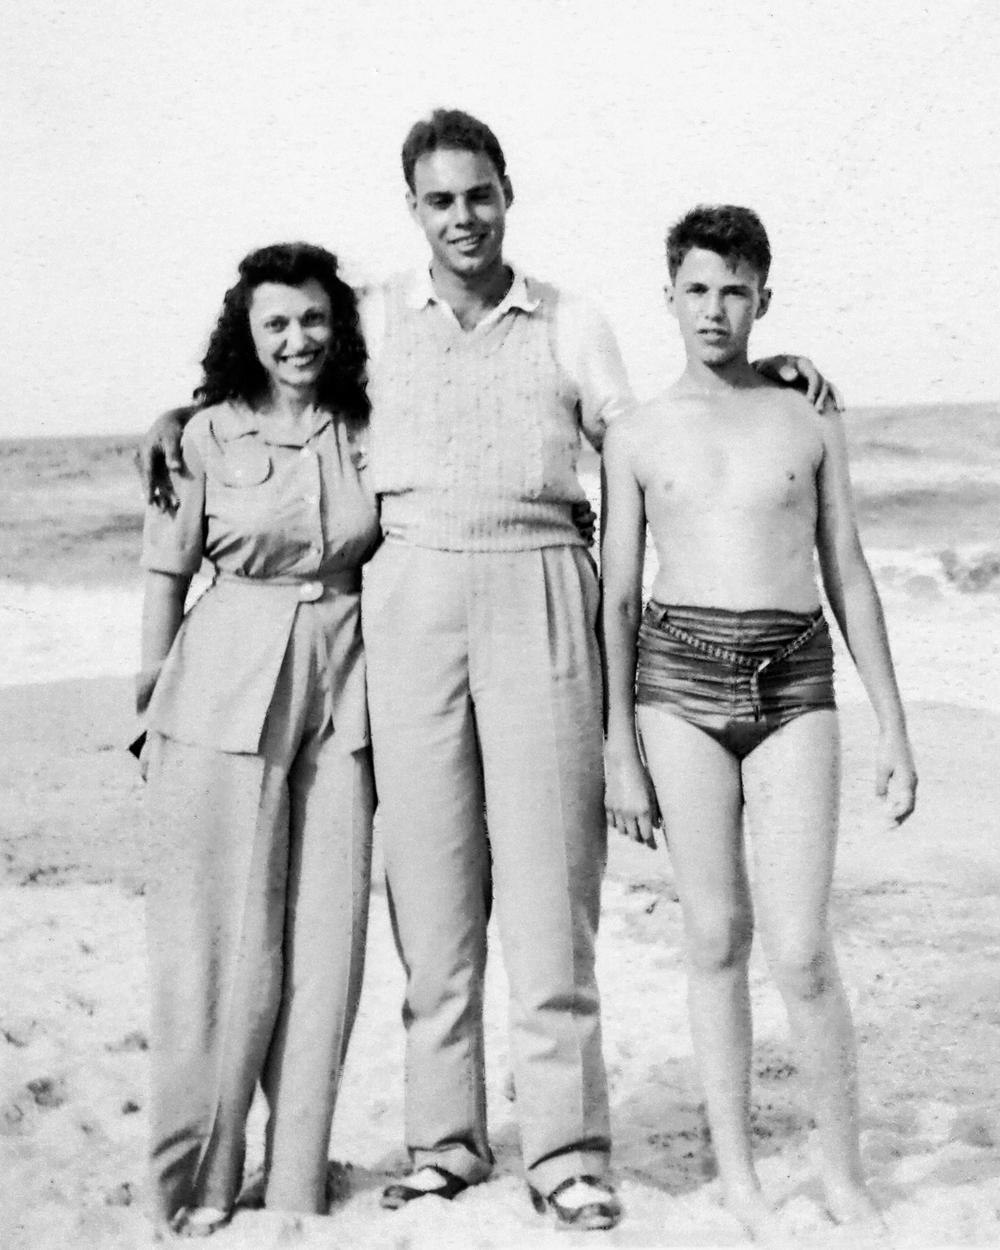 Kathryn, Doug and Buddy